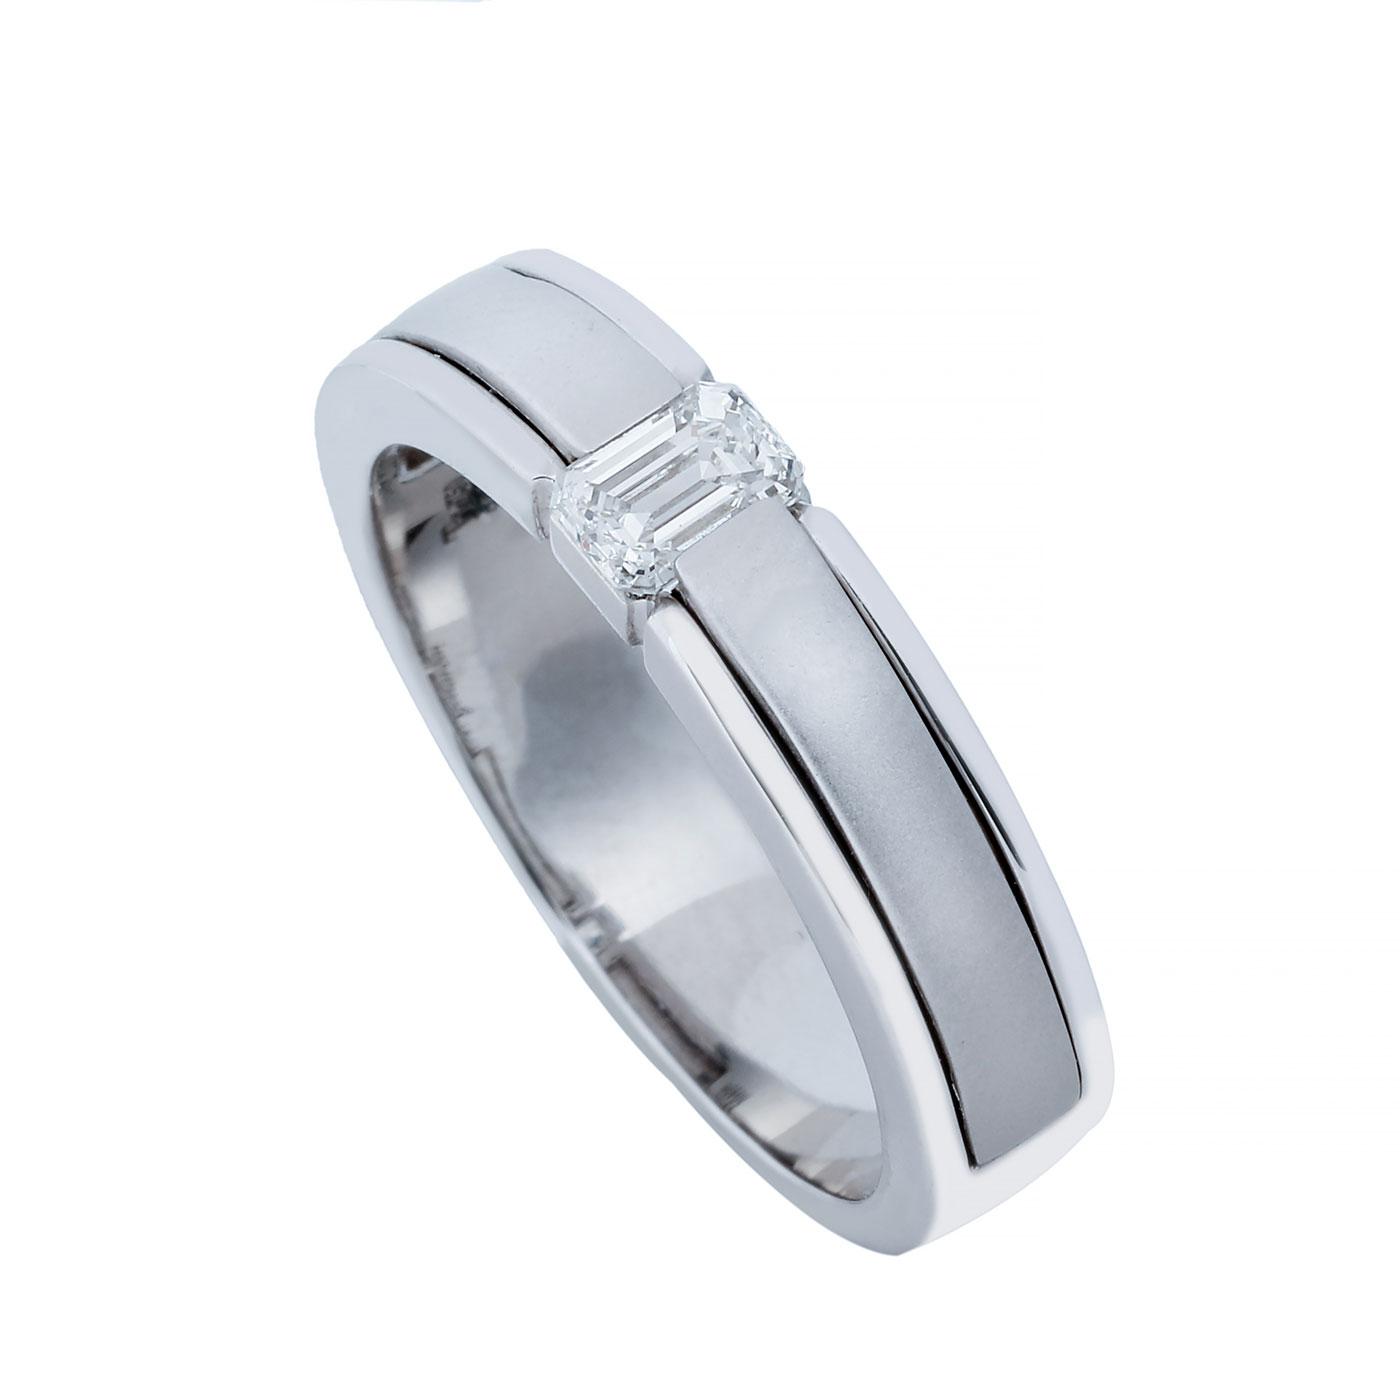 حلقه برليان 80406 B گوهربين goharbin